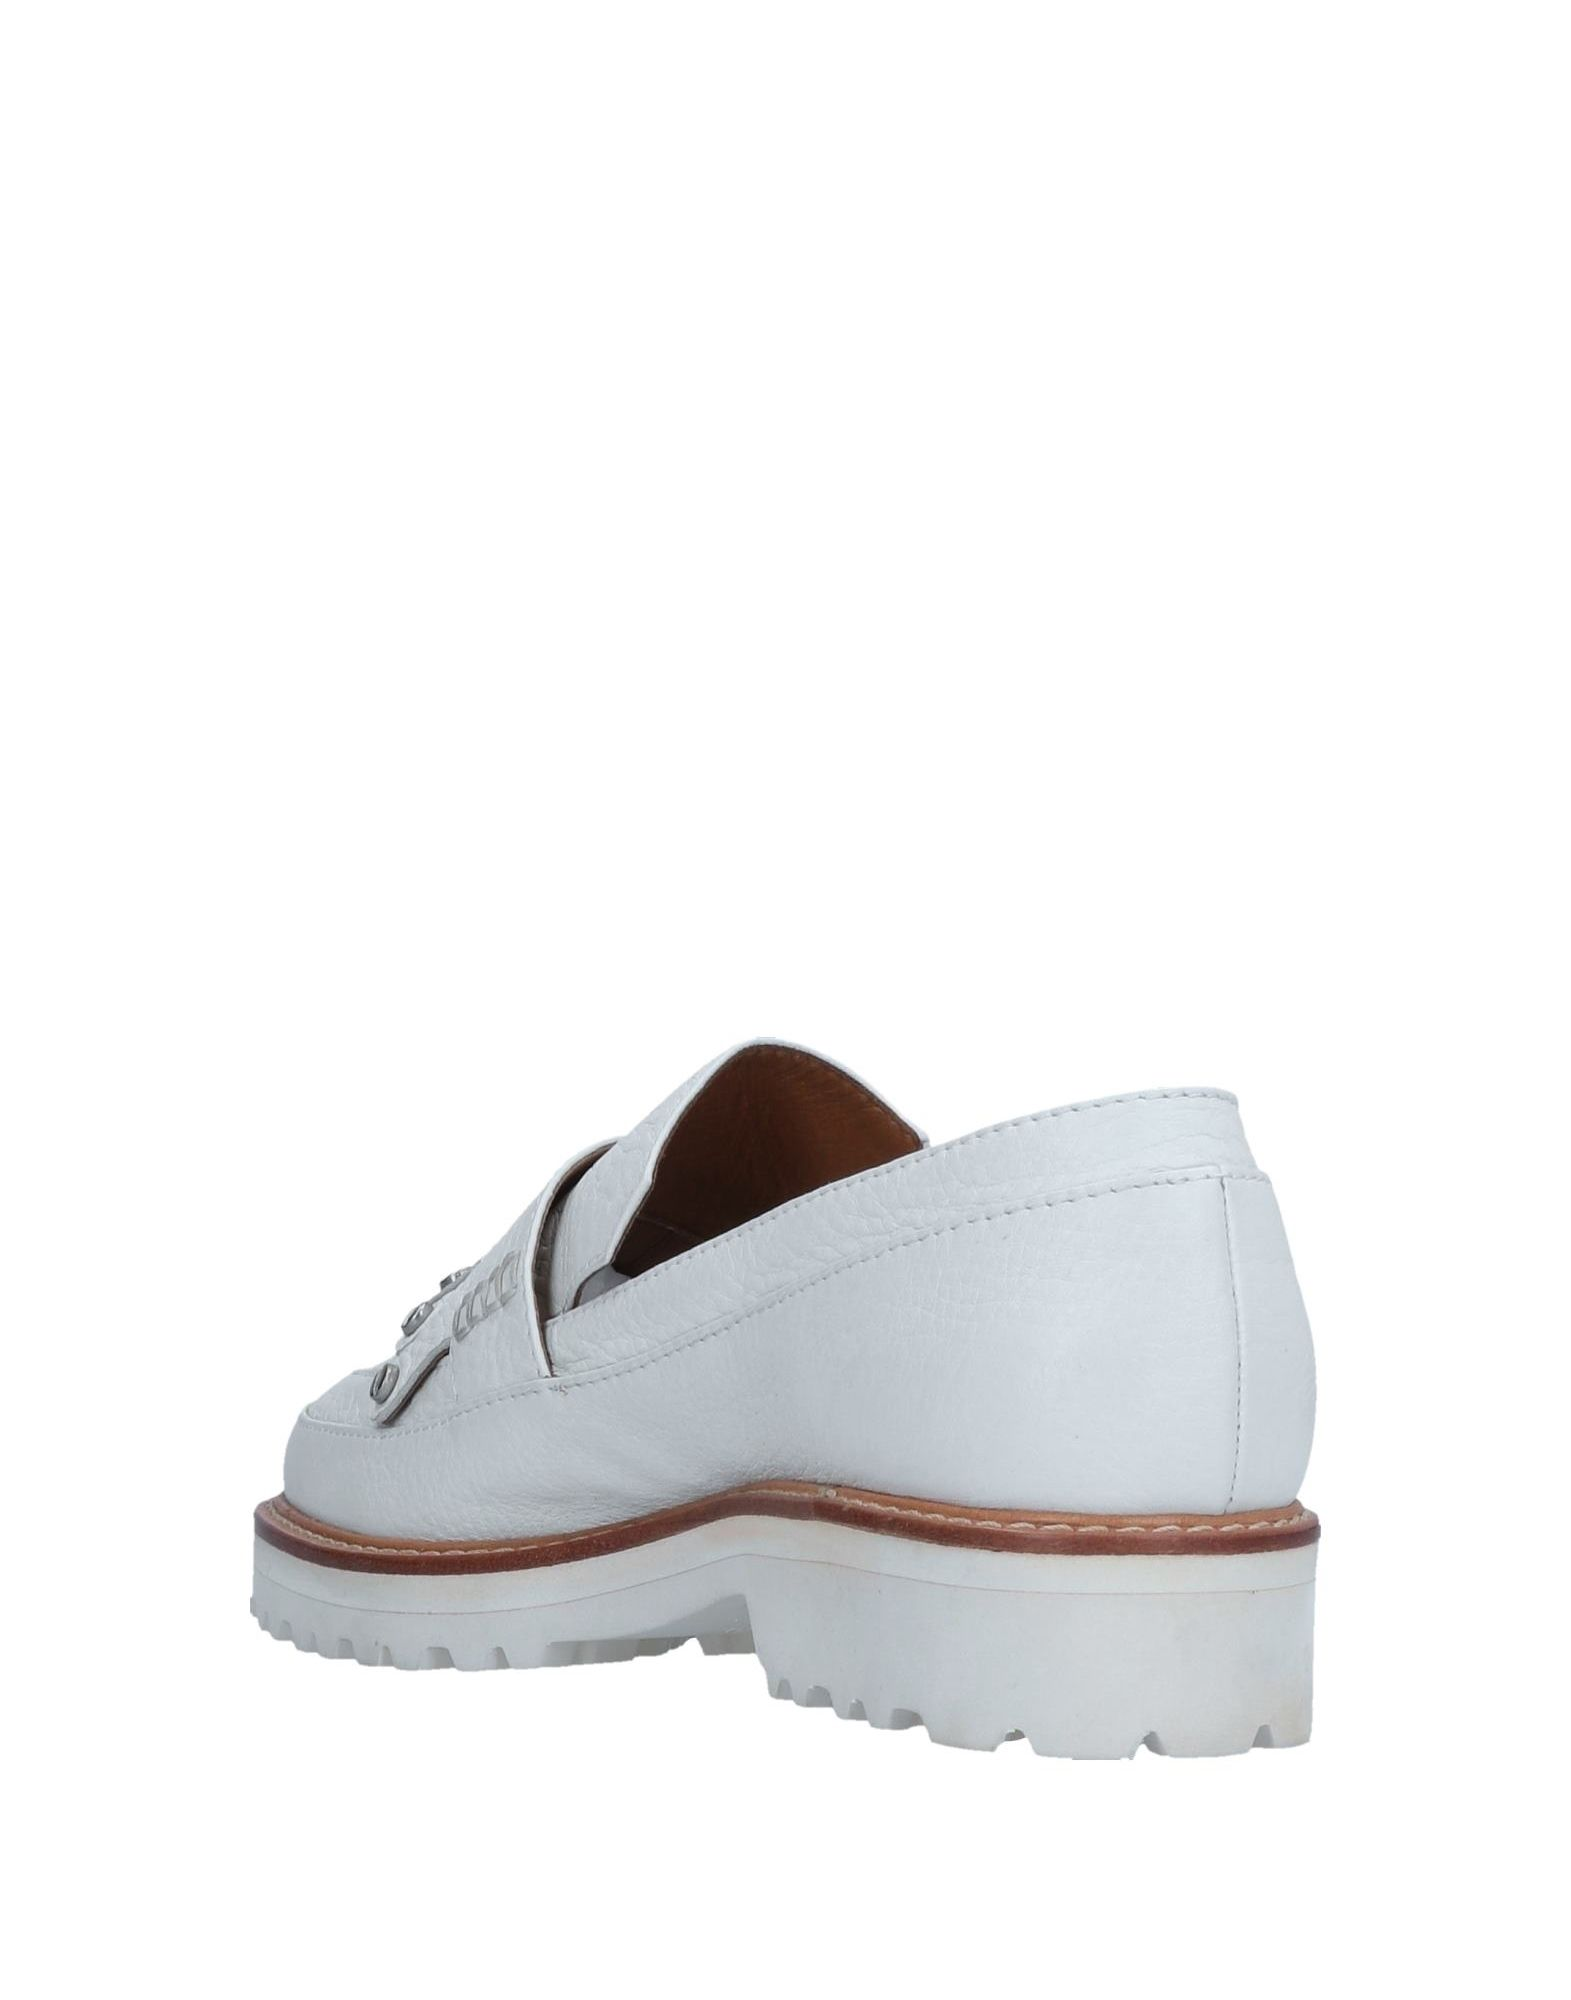 Stilvolle billige Mokassins Schuhe 18 Kt Mokassins billige Damen  11500044MV dca76c